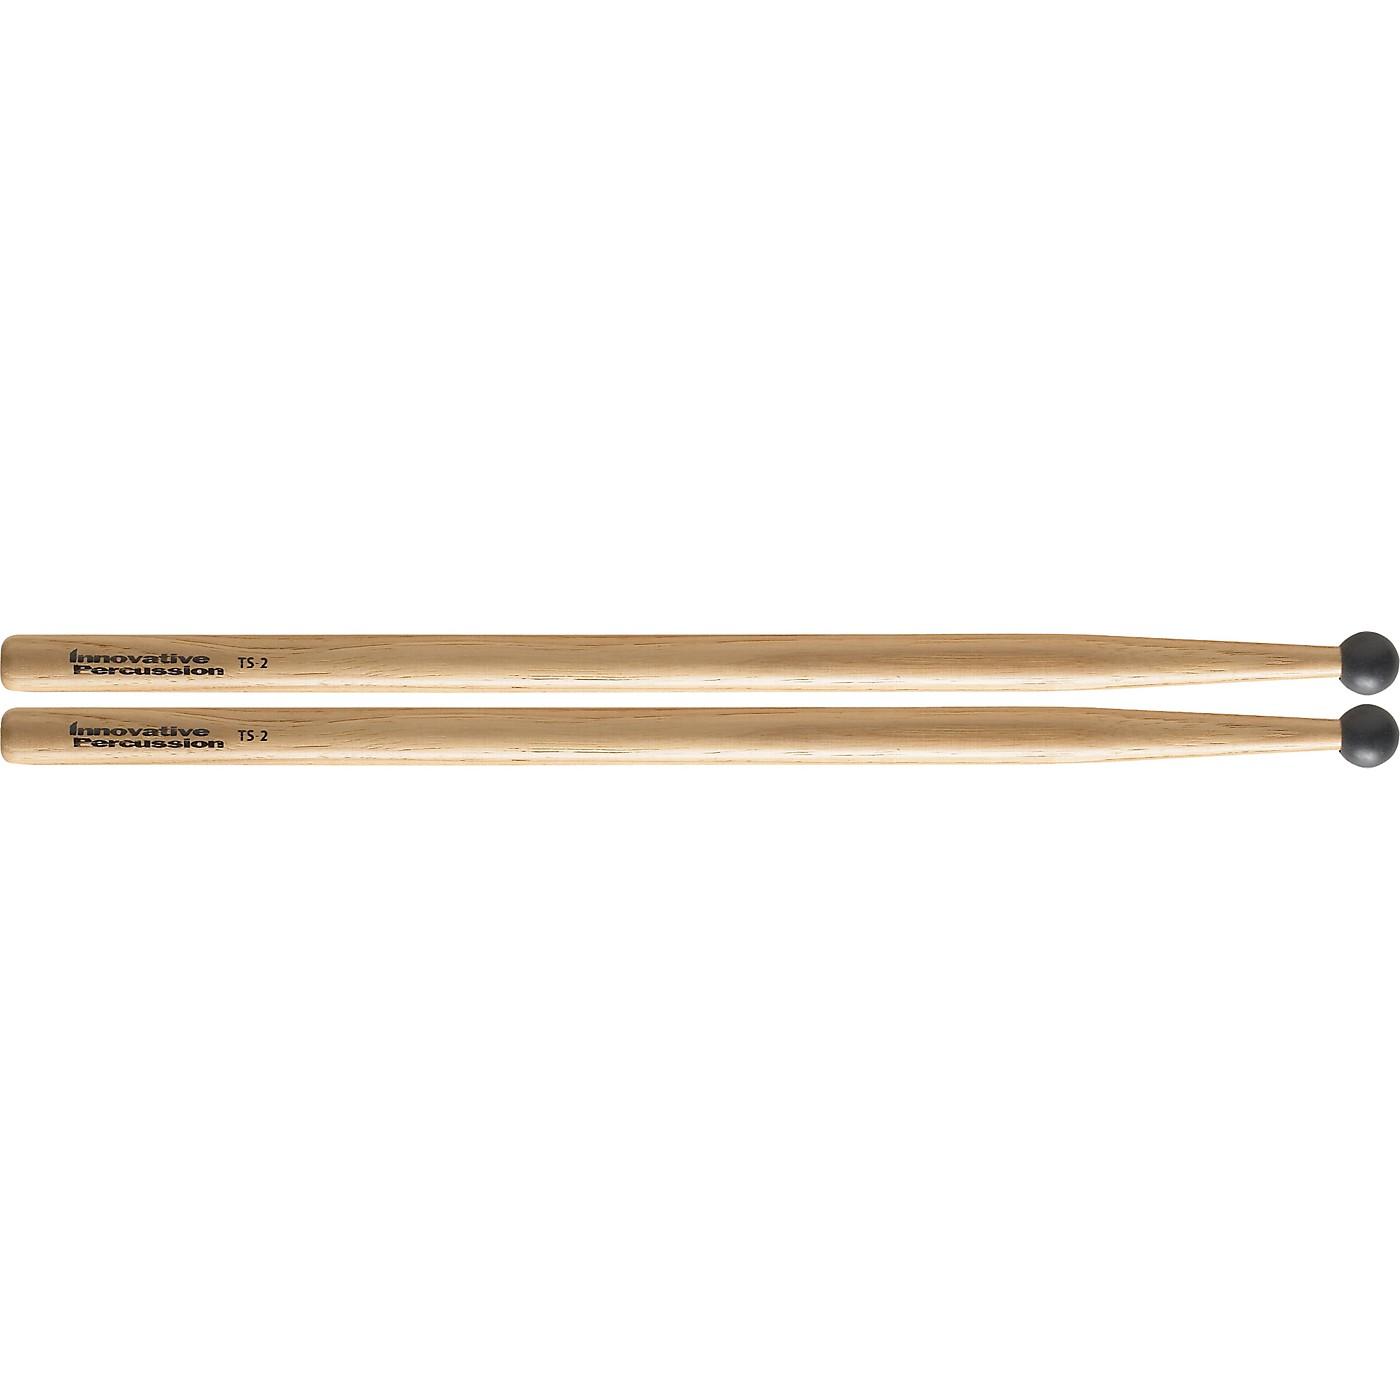 Innovative Percussion Field Series Multi-Tom Hickory Drum Sticks thumbnail